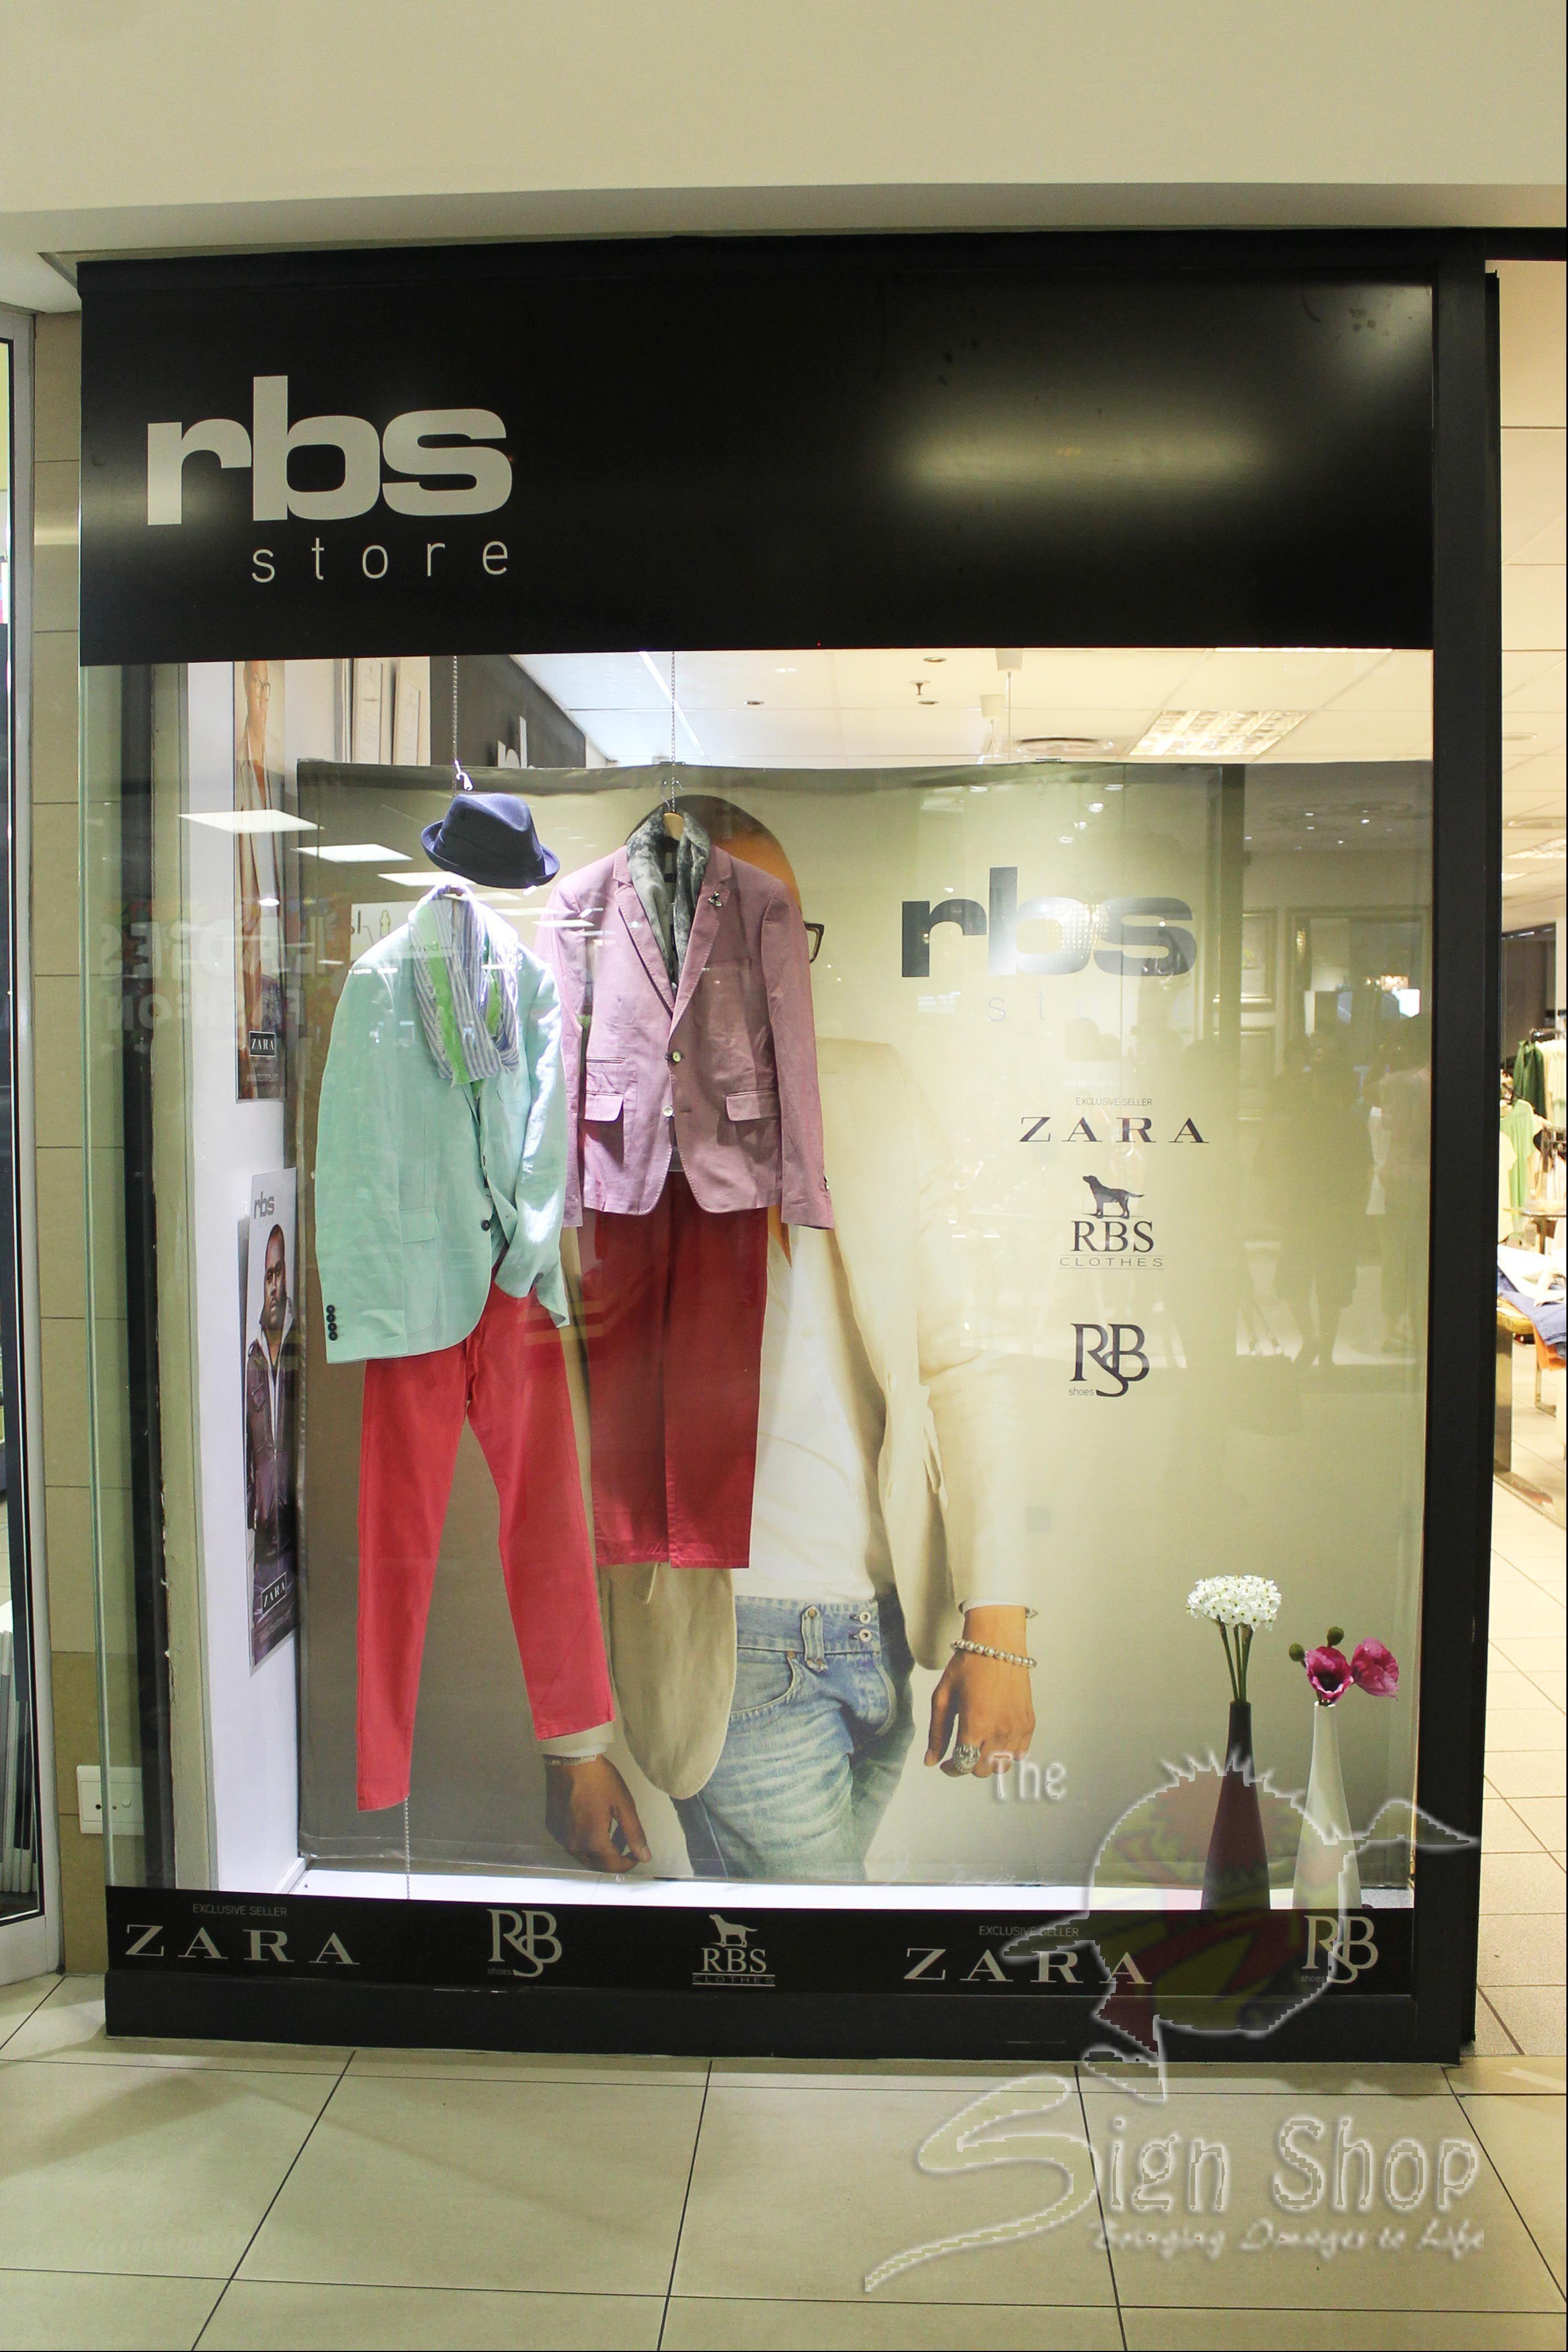 RBS Clothing Store Branding